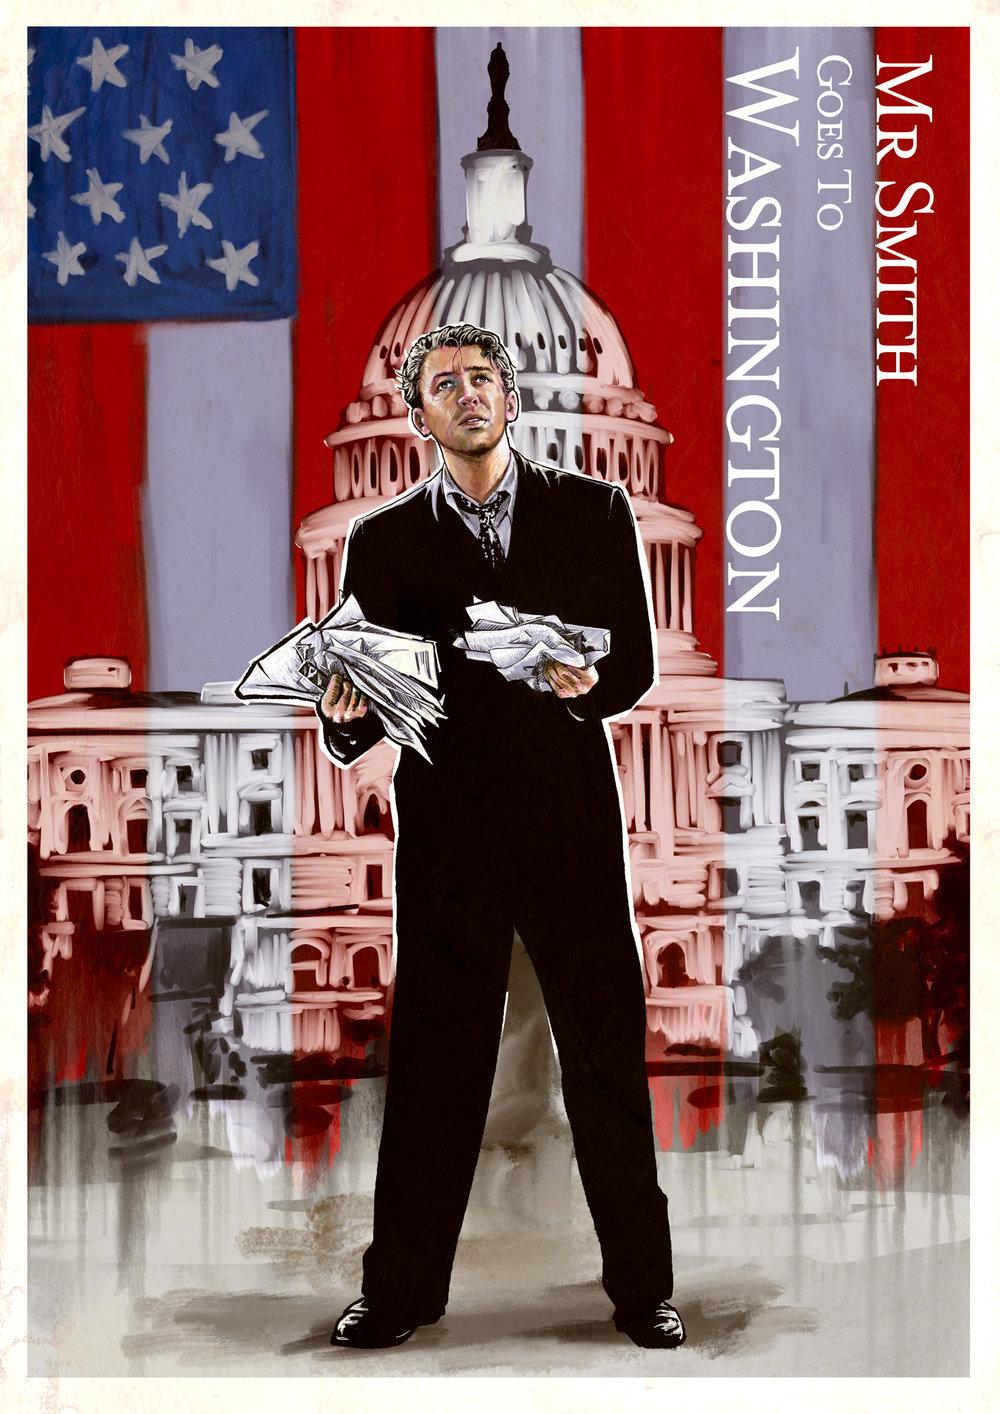 Mr Smith Goes To Washington_alt title